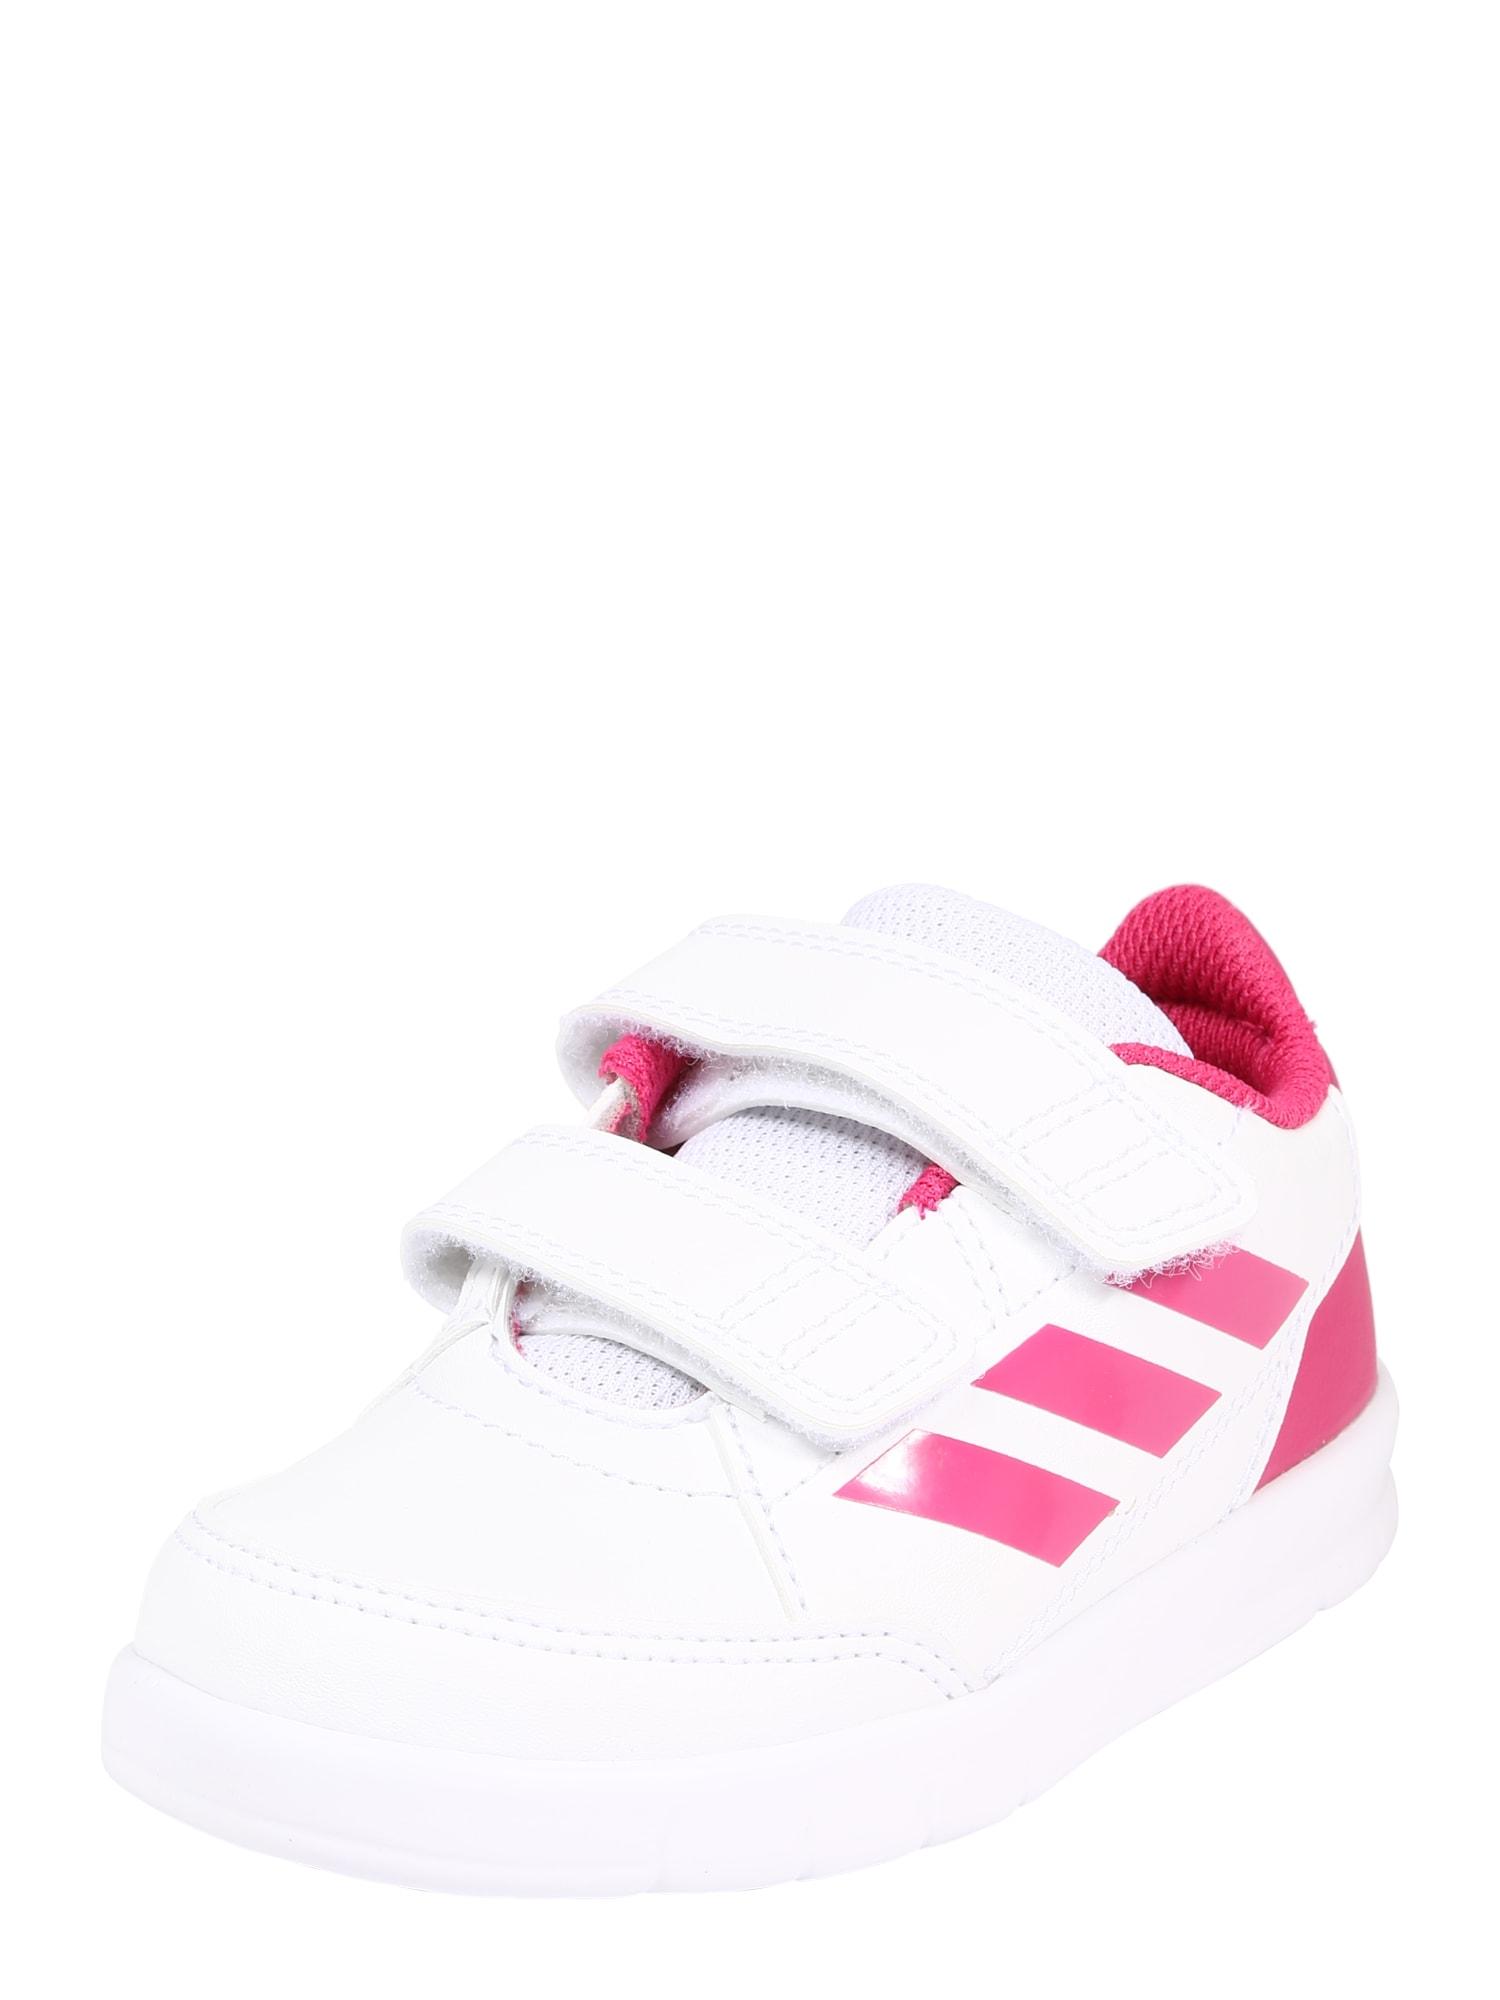 Sportovní boty AltaSport CF I pink bílá ADIDAS PERFORMANCE